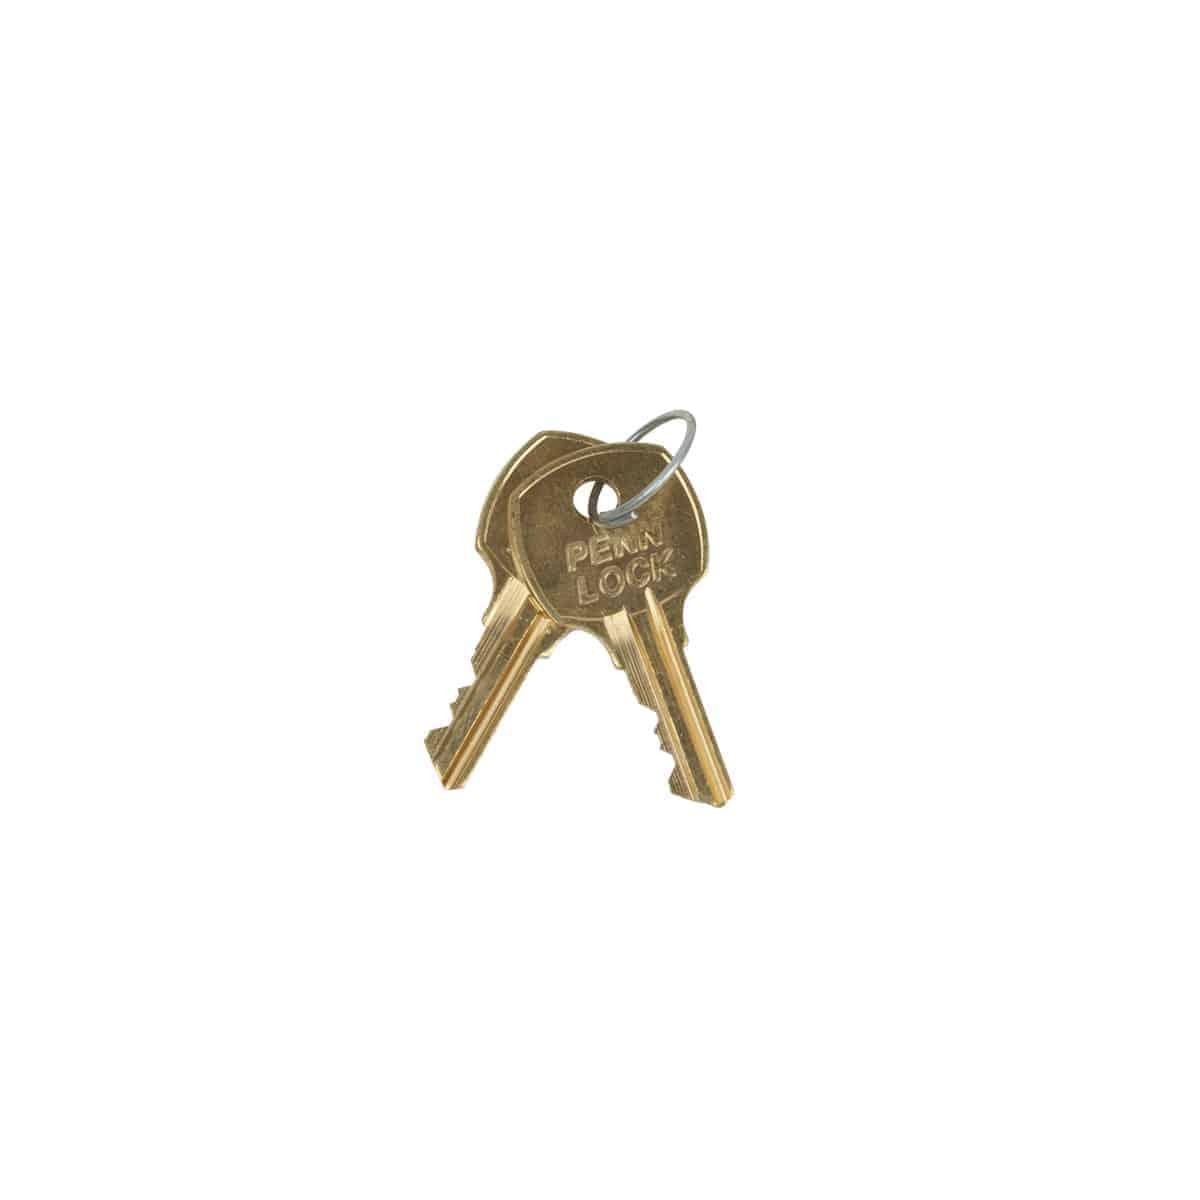 rack keys